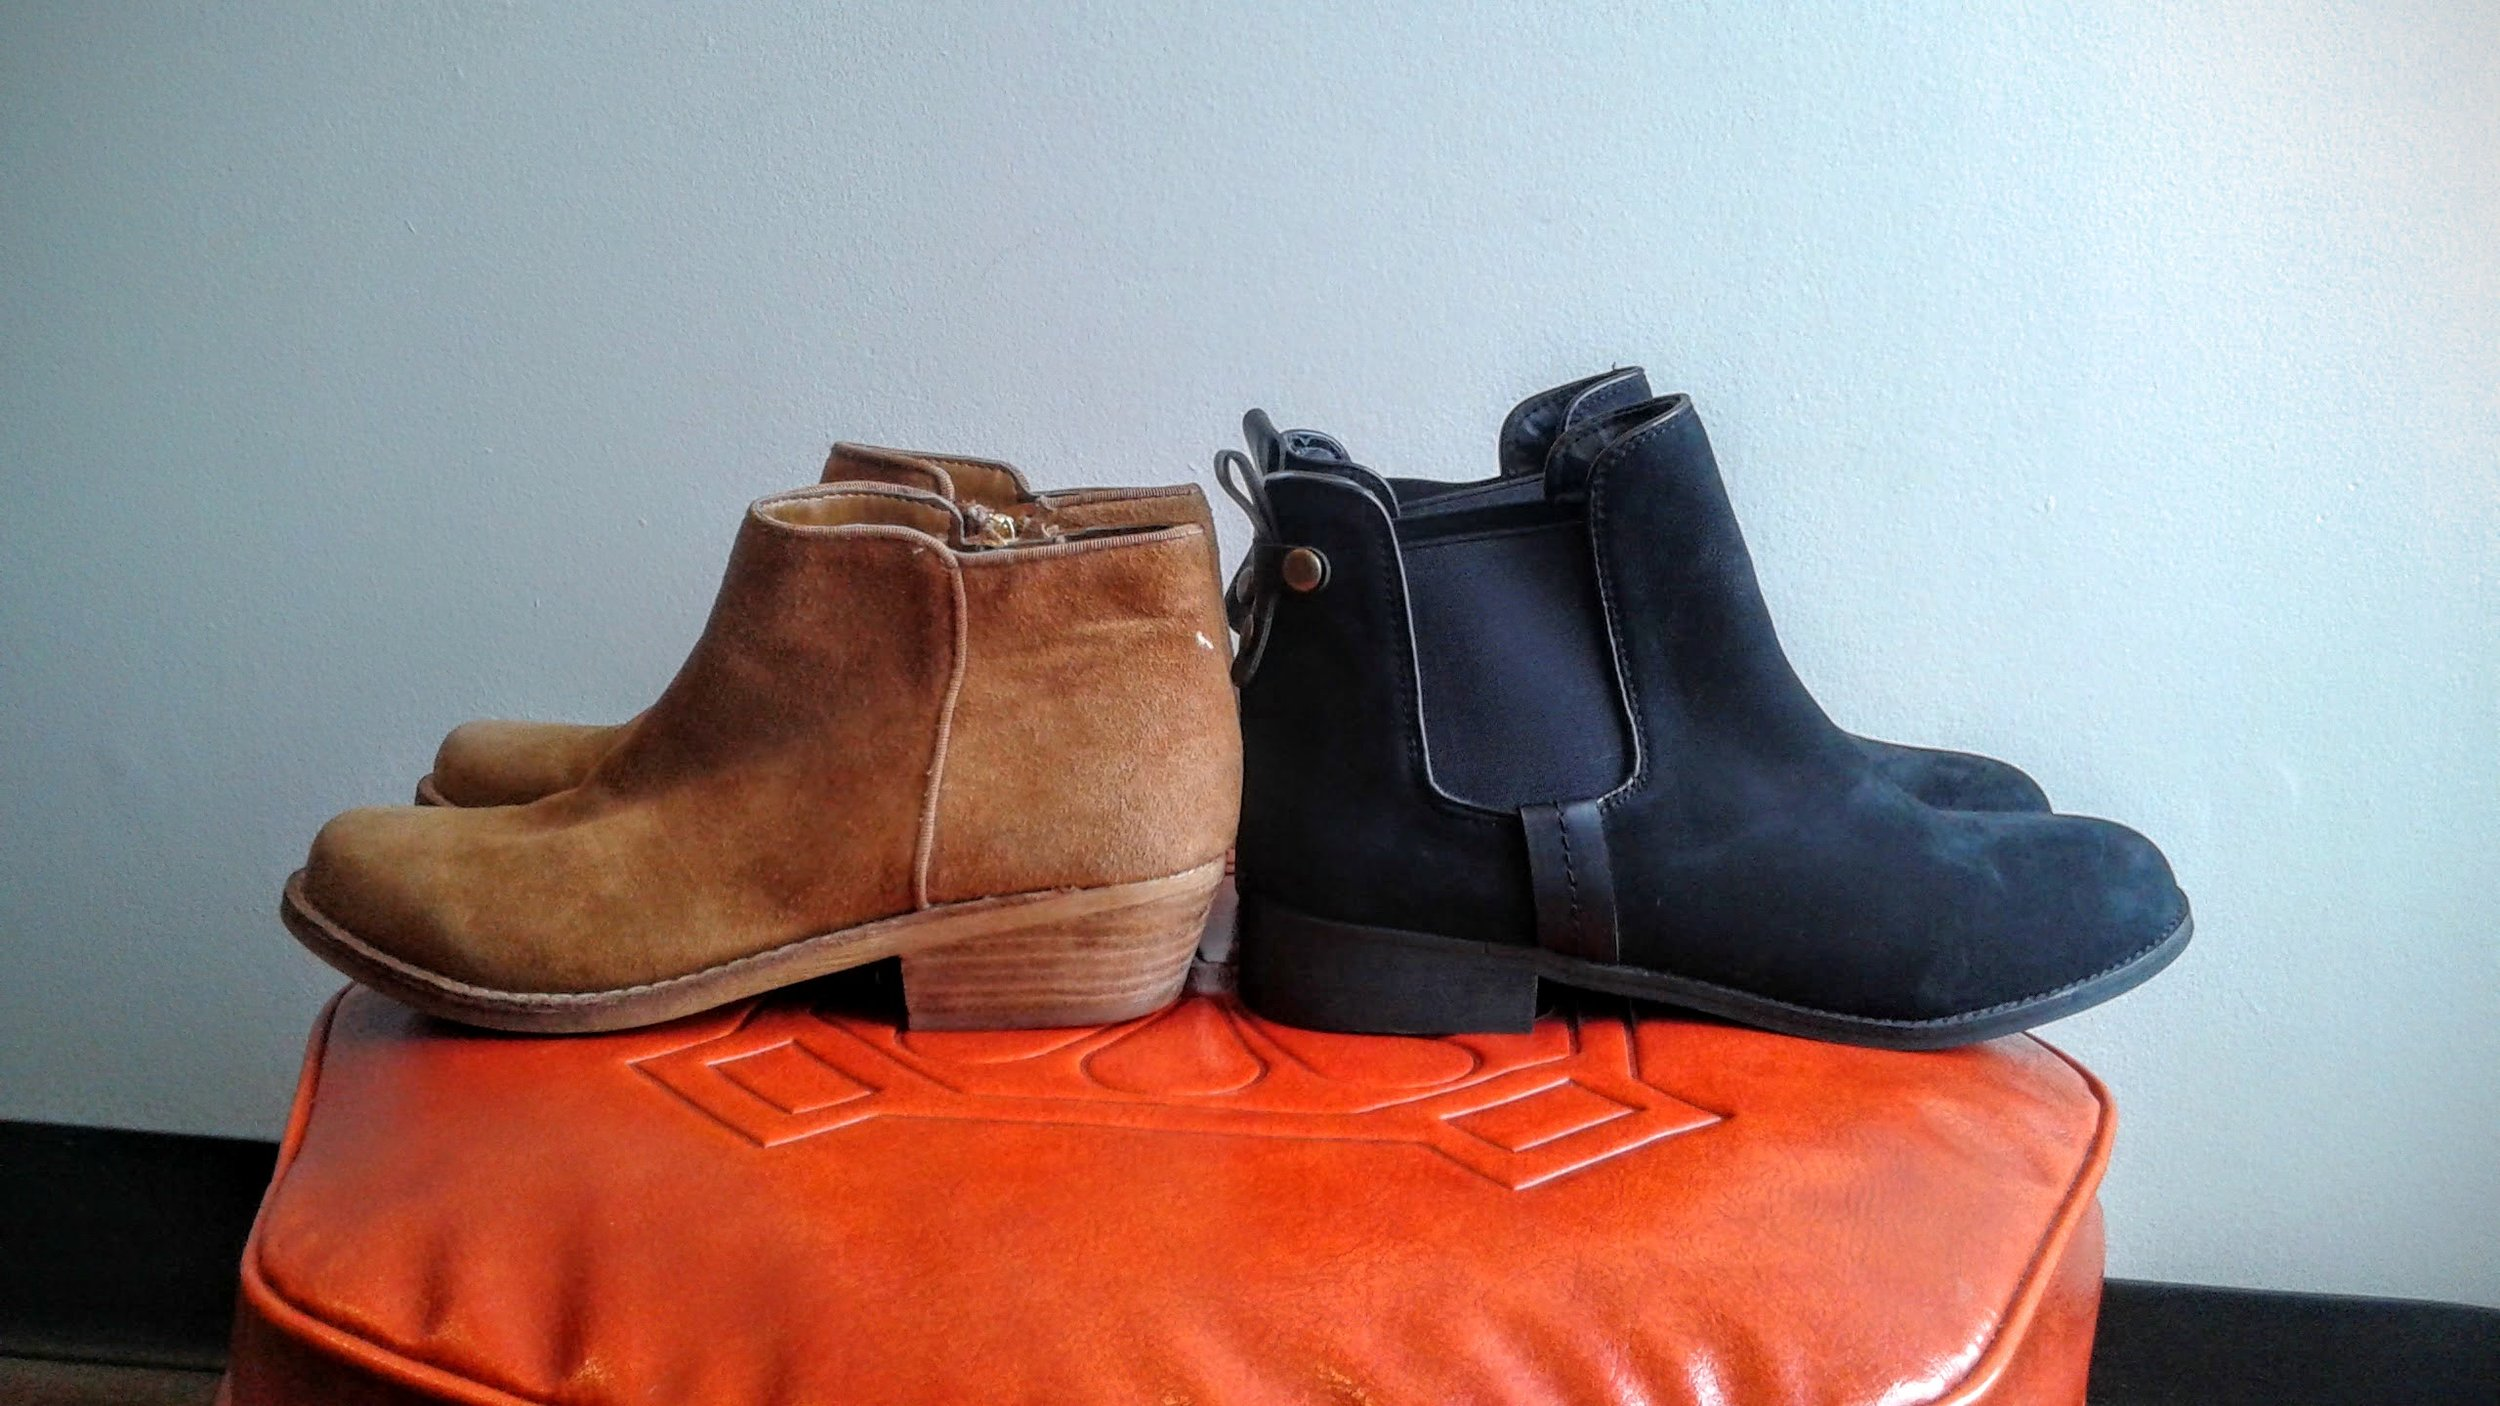 Sam Edelman tan booties, S7.5, $55;  Steve Madden  black booties, S7.5, $45